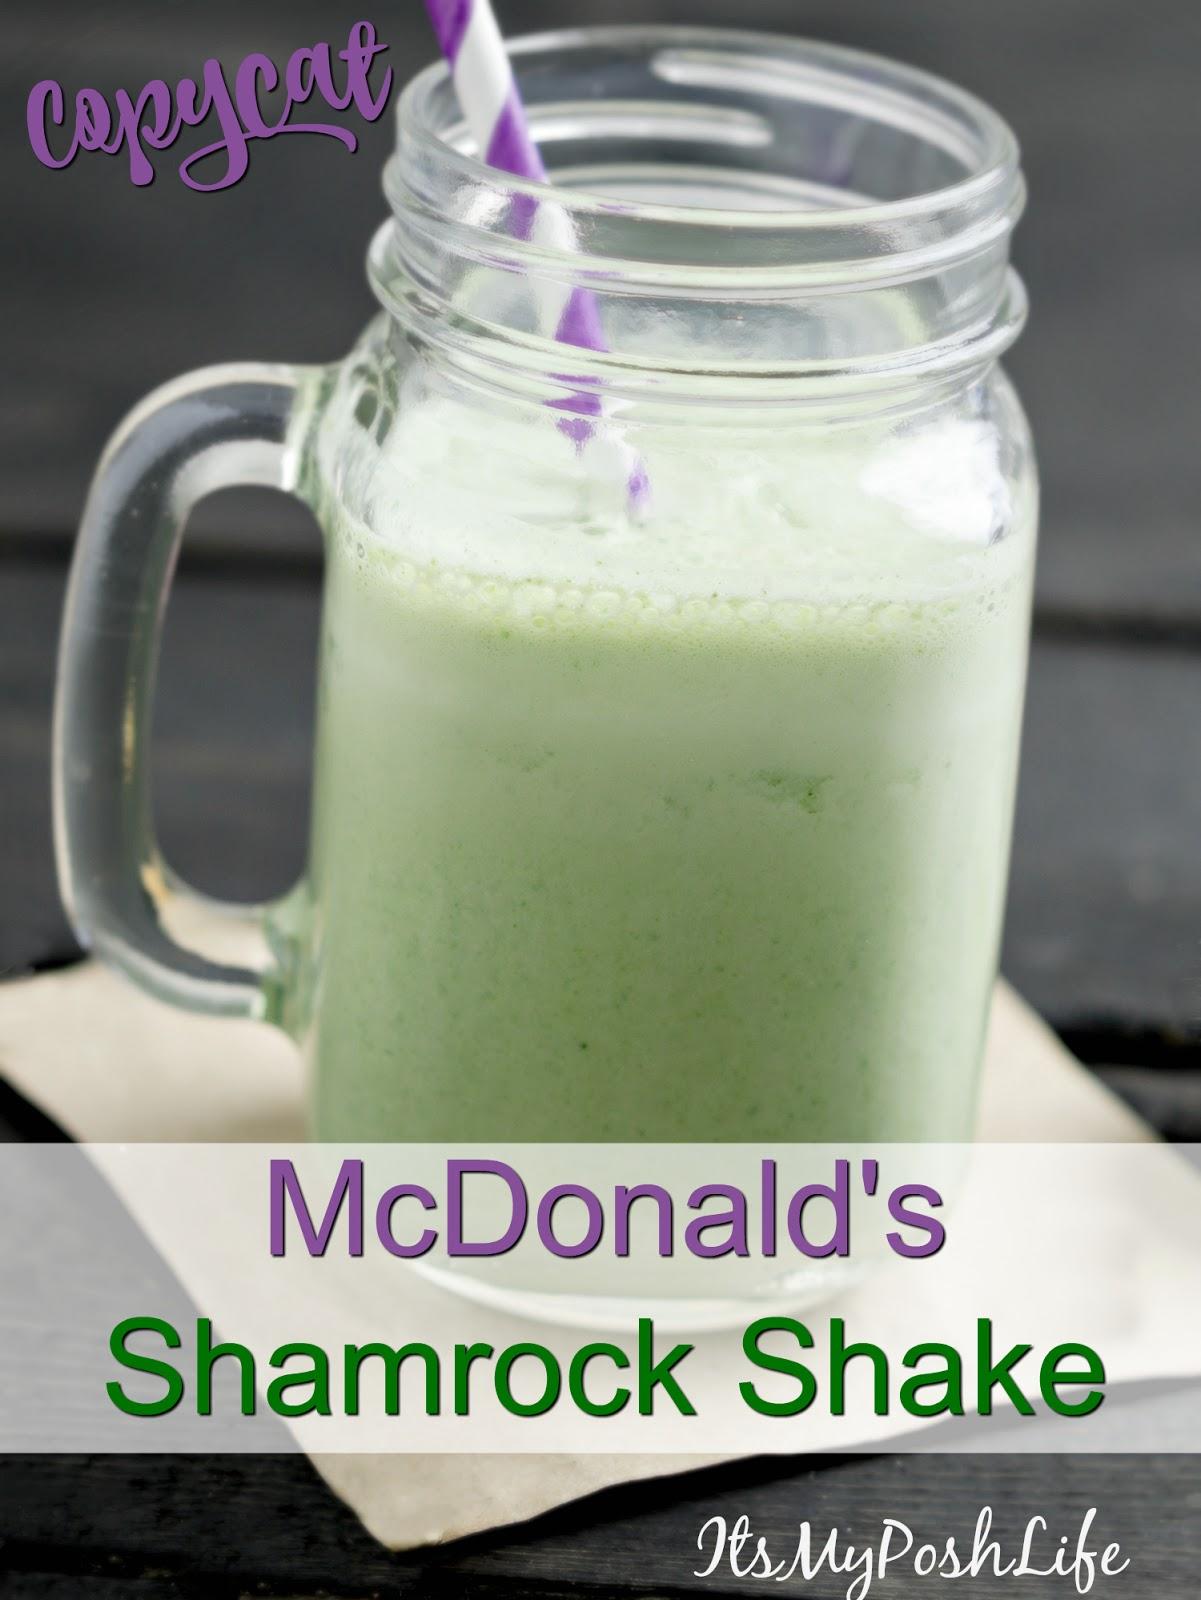 Copycat McDonalds Shamrock Shake- A Healthier Version